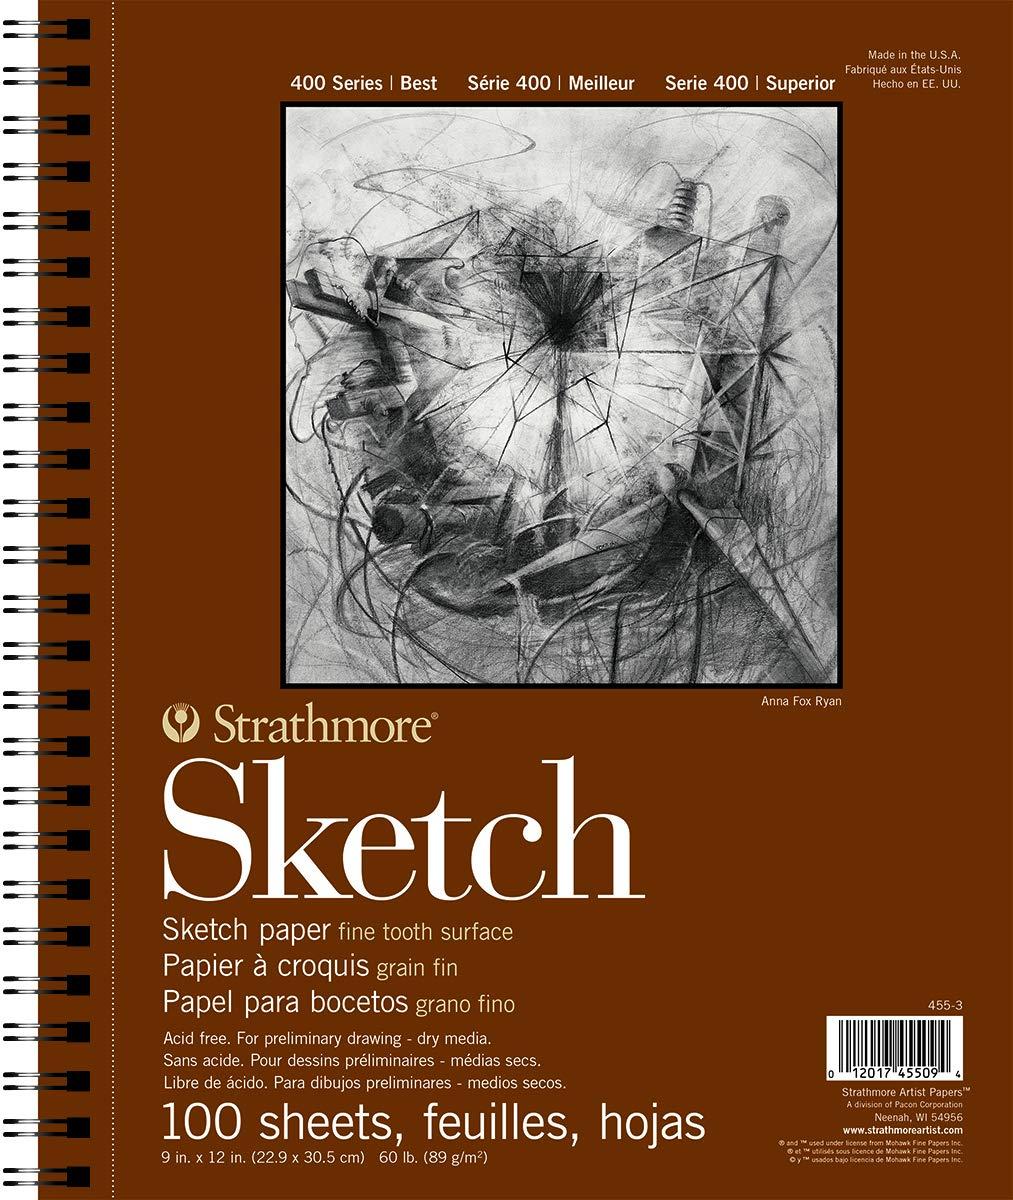 Strathmore 400 Sketch Pads 12